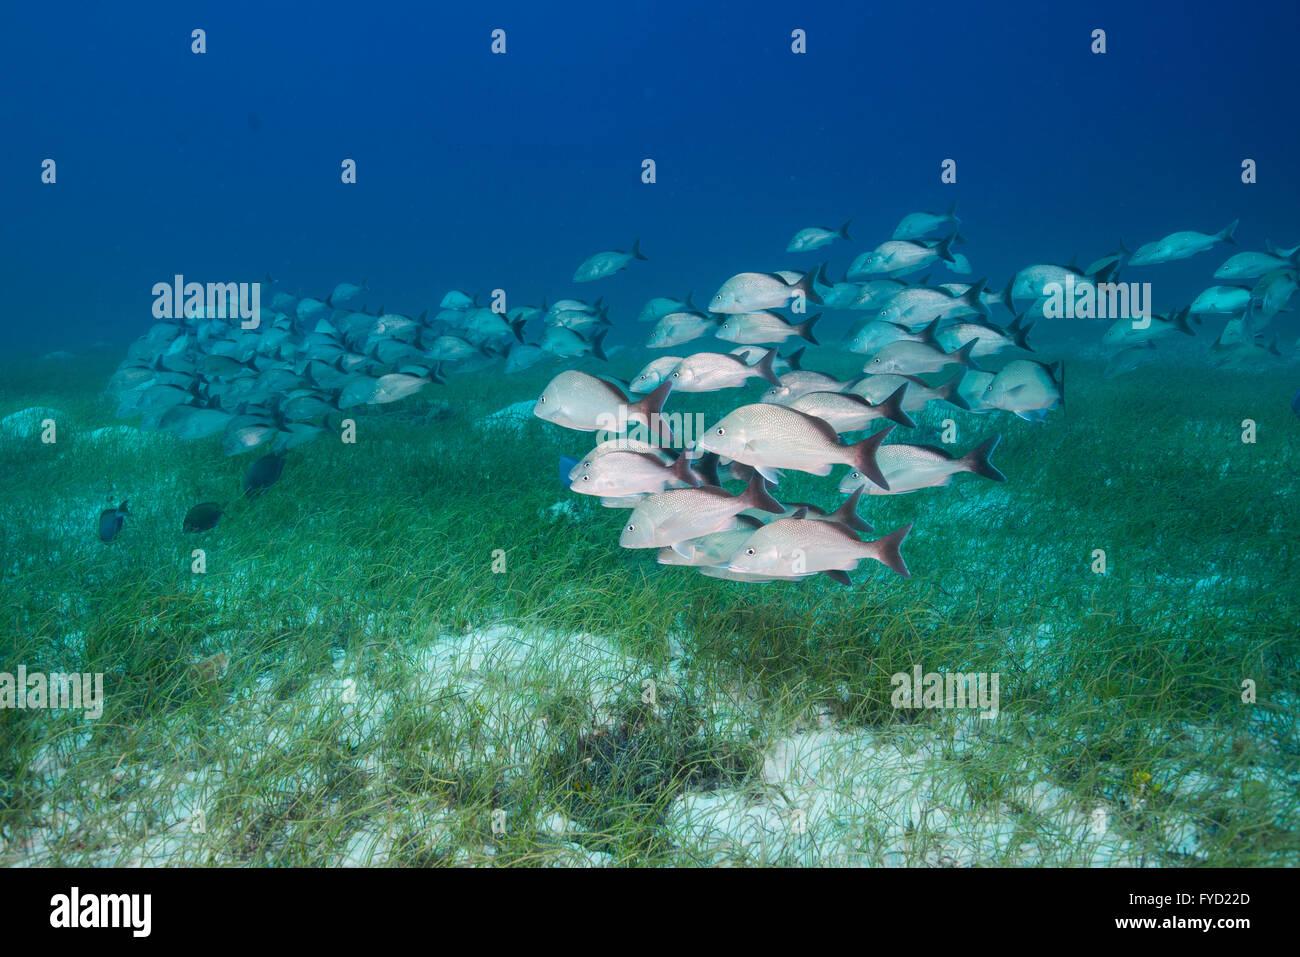 White margate, Haemulon album, a school swimming over seagrass, Bahamas - Stock Image